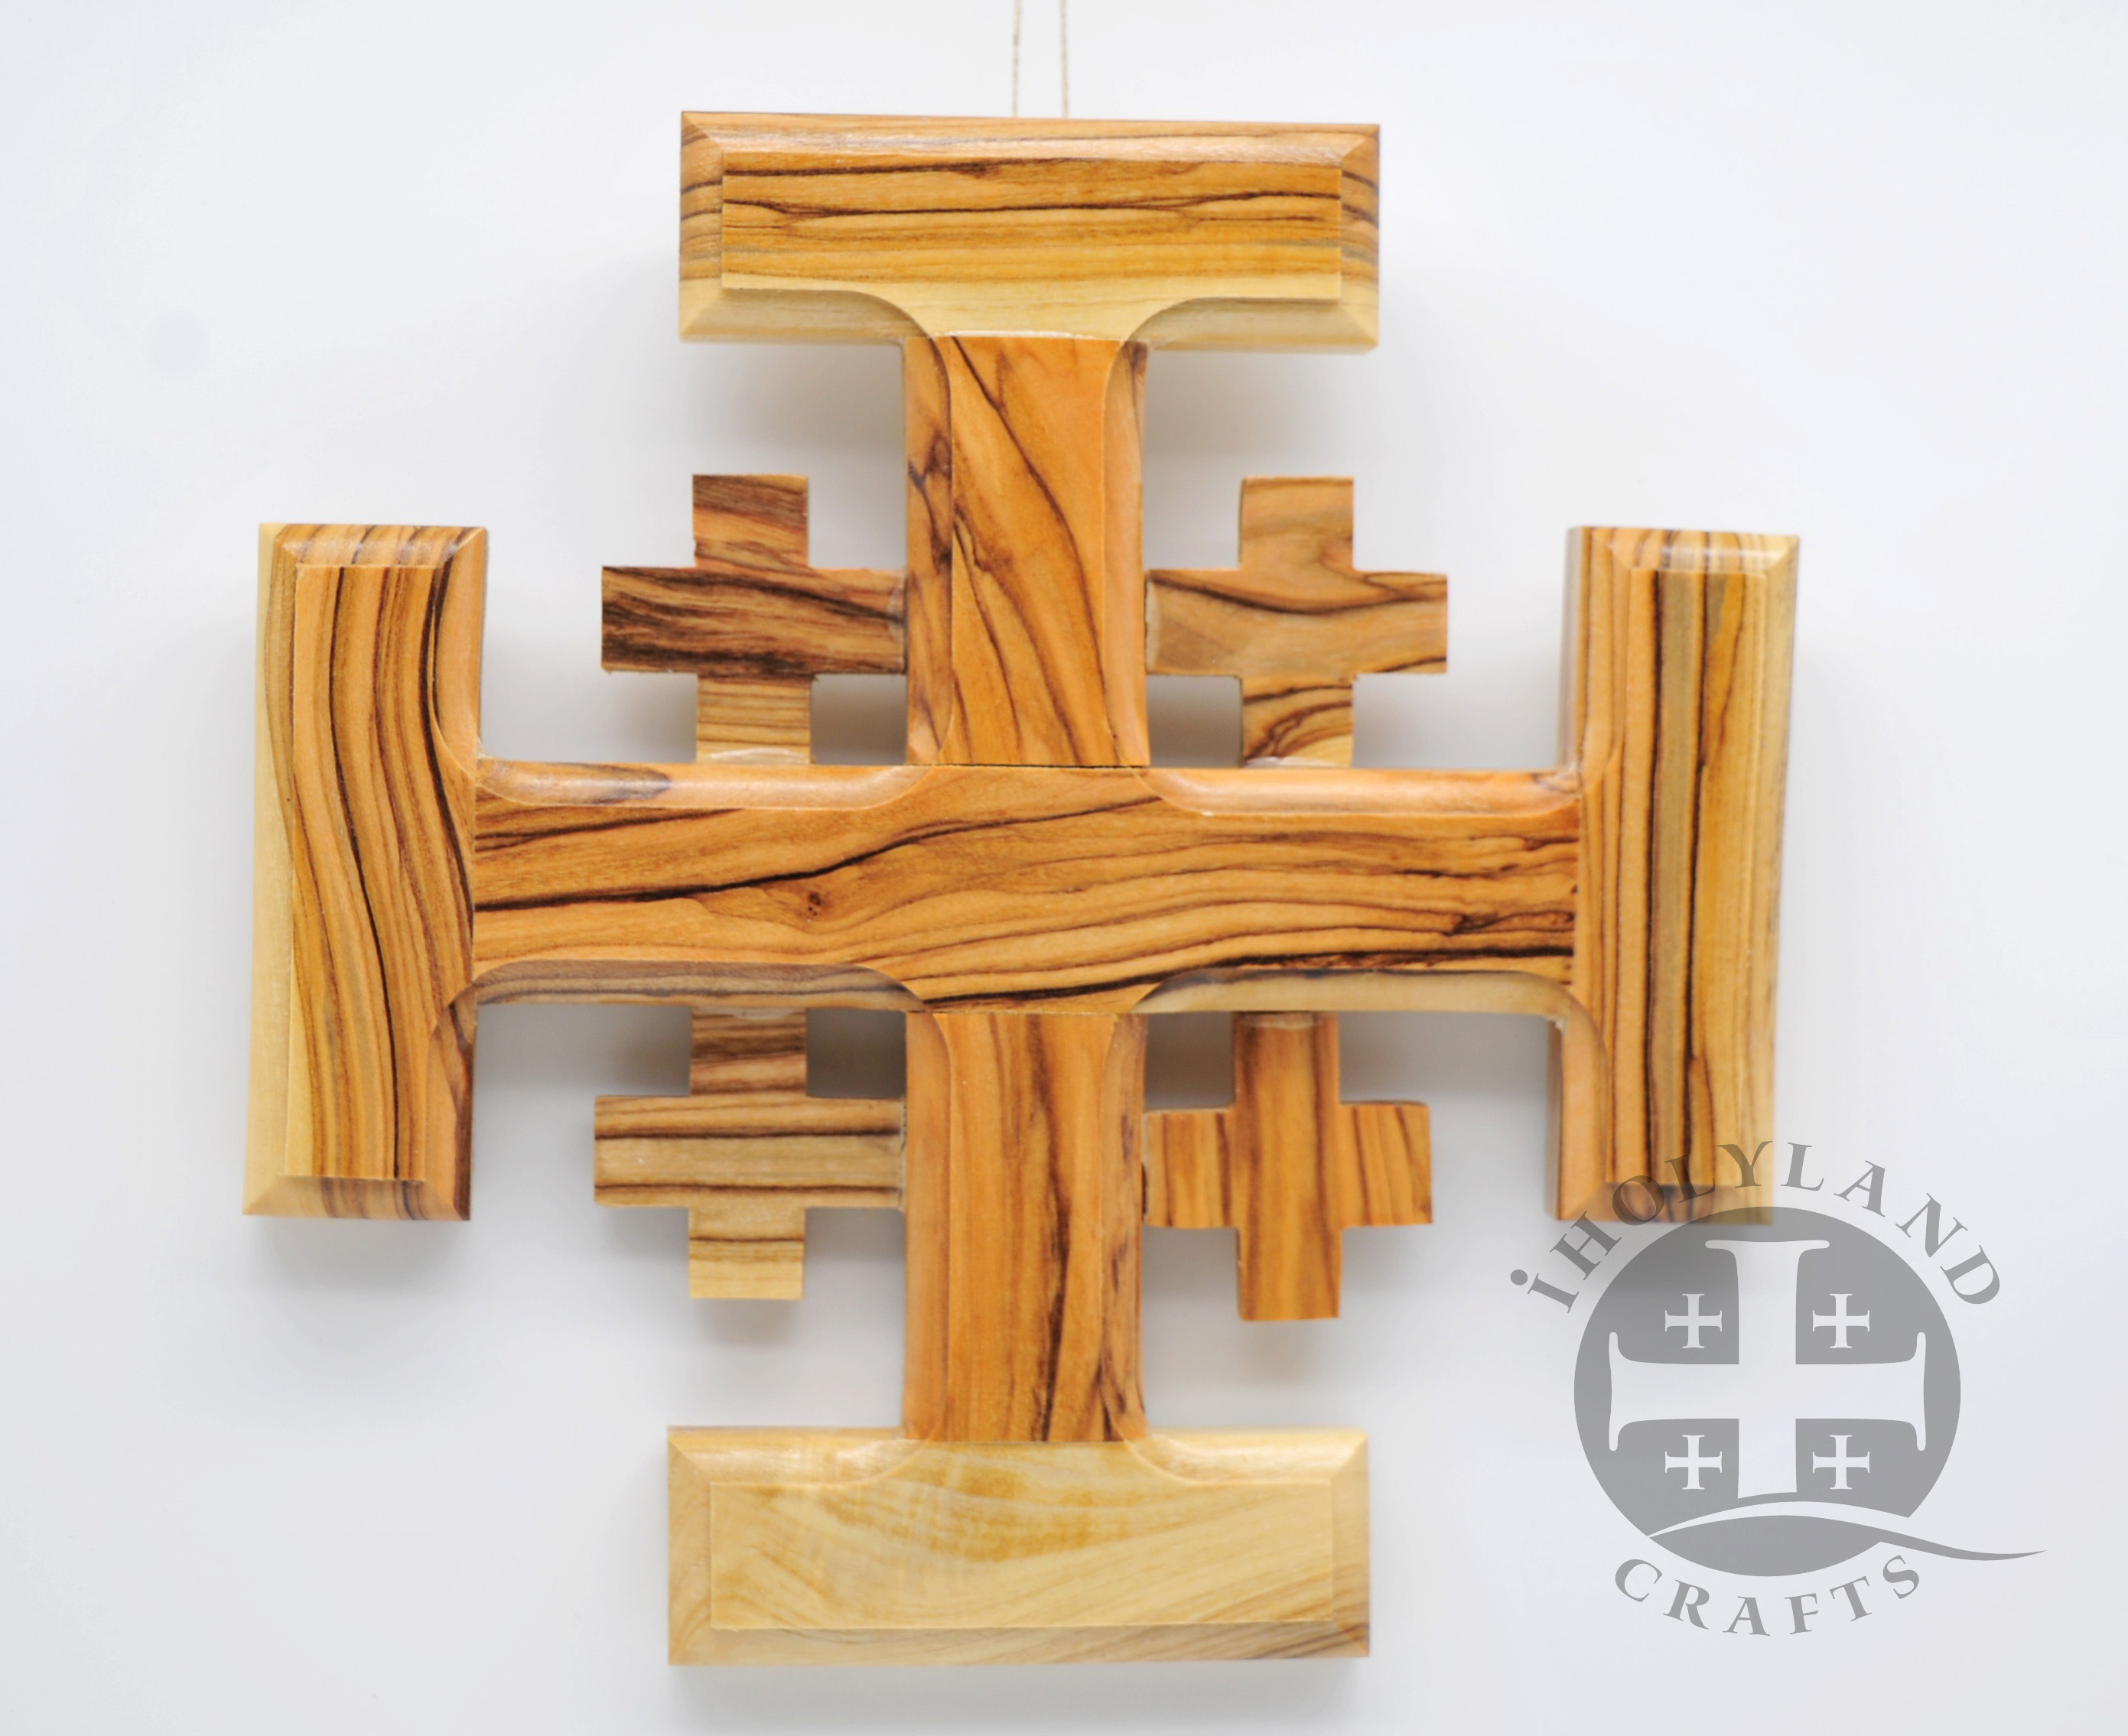 Olive Wood Cross Made in Bethlehem Jerusalem Size L//15.8 x W//9.0 cm